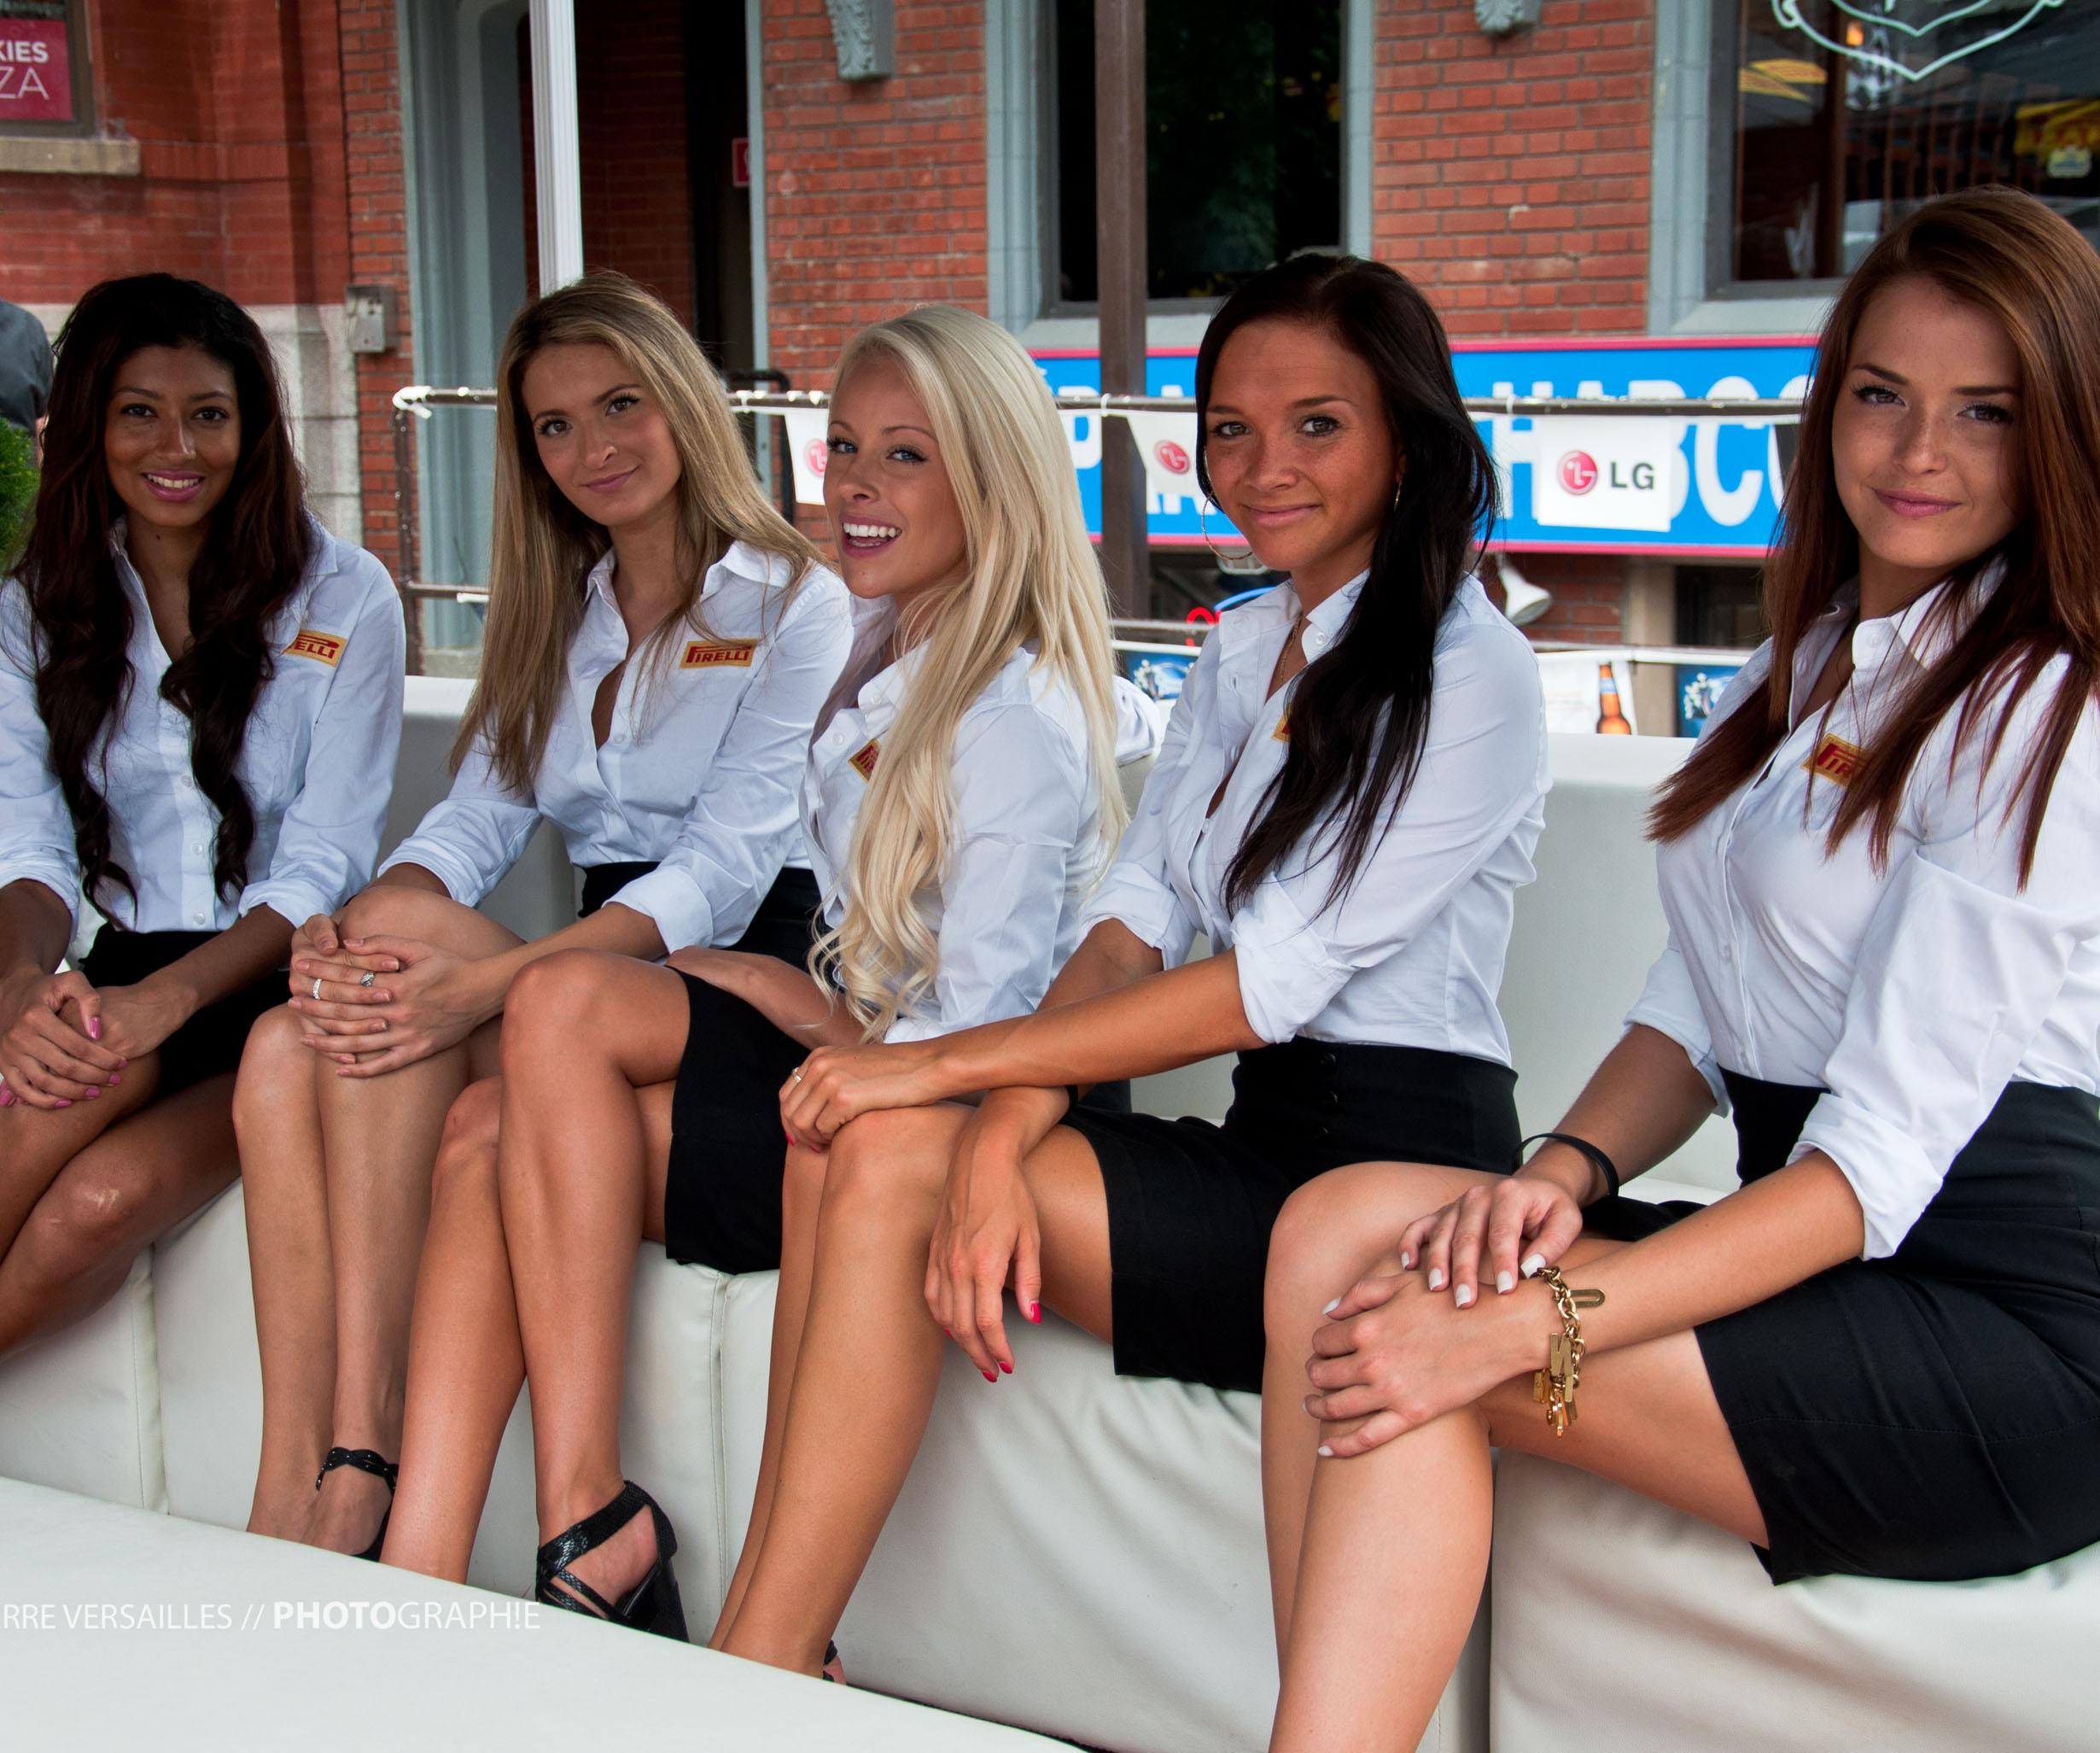 girls in quebec